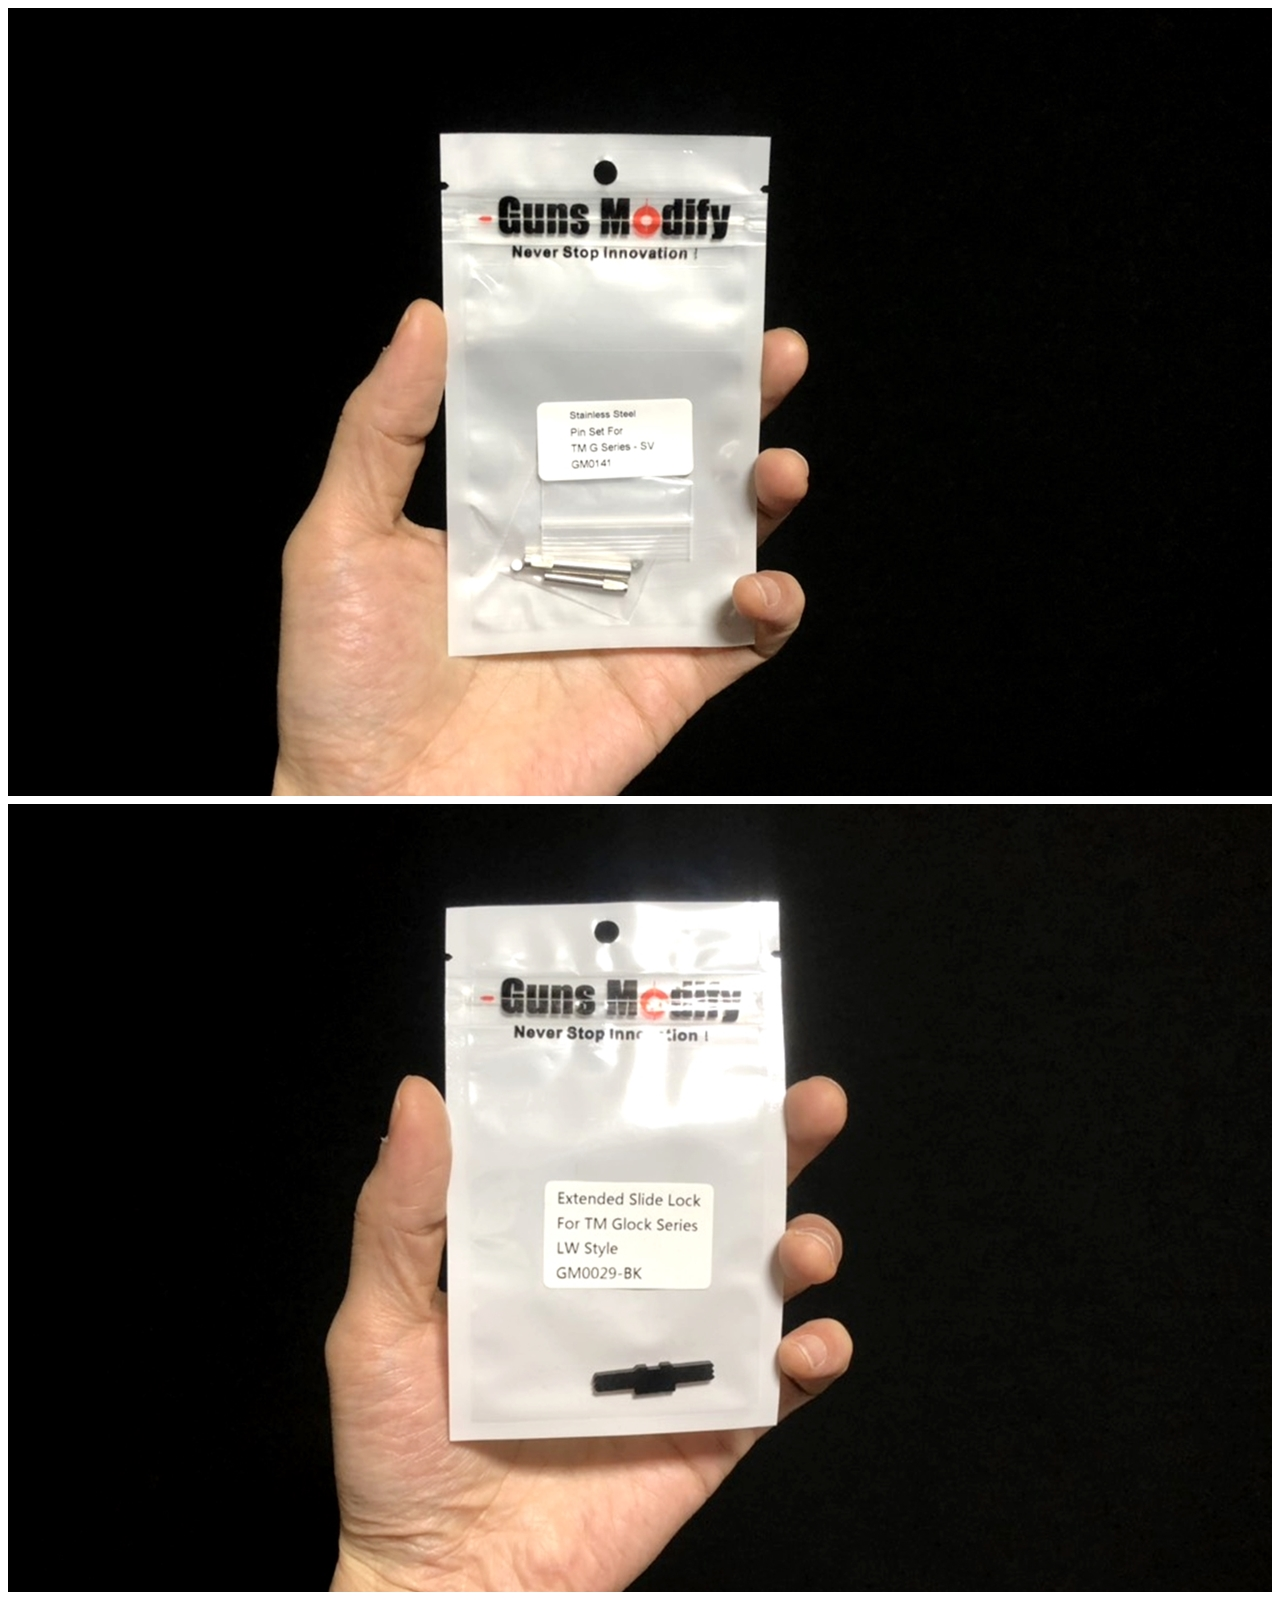 1 GLOCK G18C カスタムしたるぞー!!続編!! Guns Modify ステンレス フレーム ロックピン & エクステンドスライドロック!! 購入 取付 交換 カスタム レビュー!!